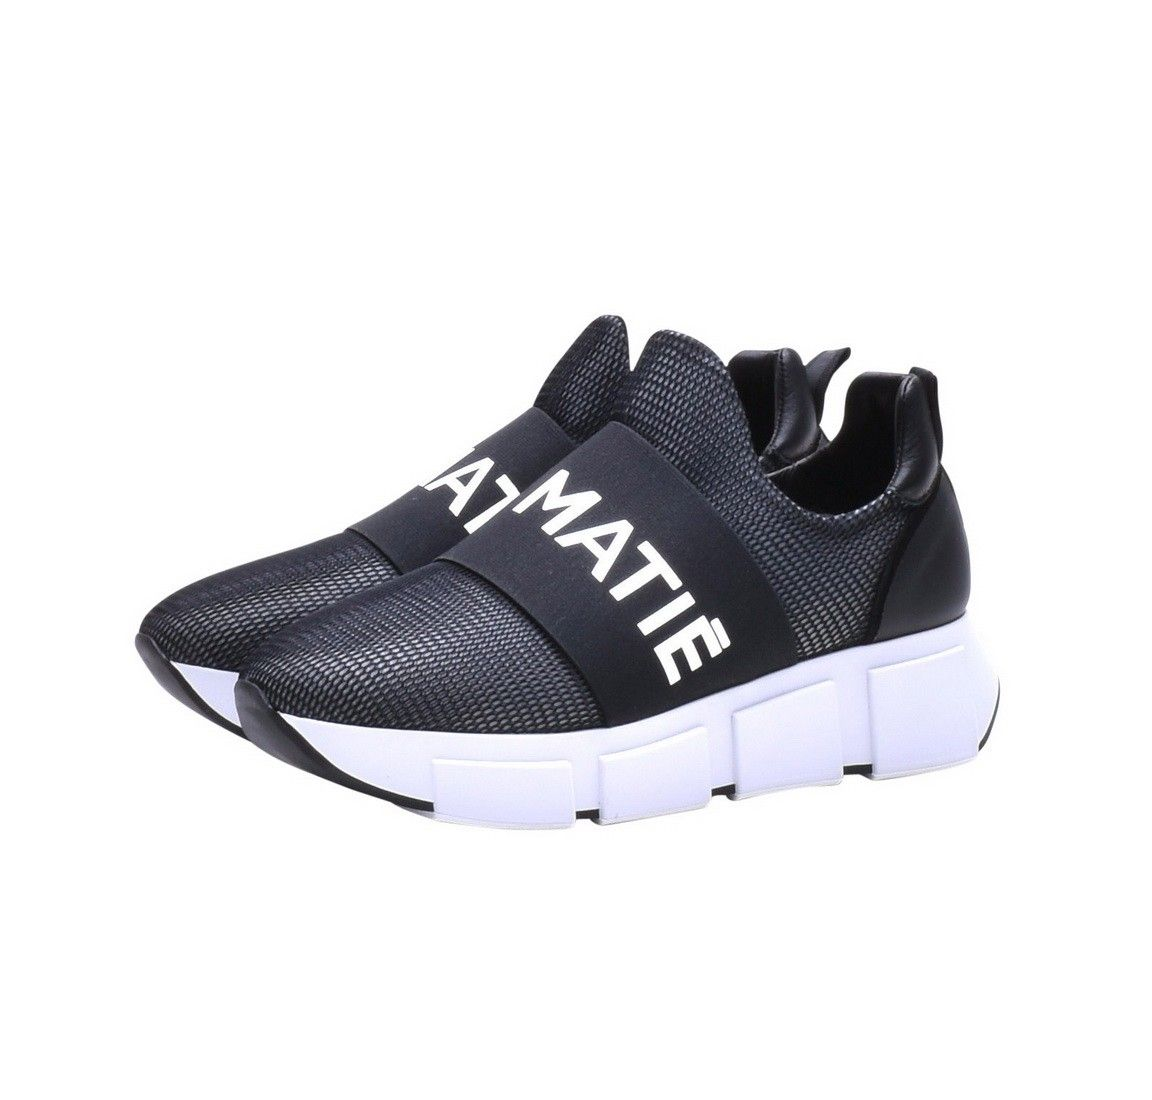 VIC MATIÉ - Damen Sneaker - Scarpa Jam/Lam/Velvet - Black